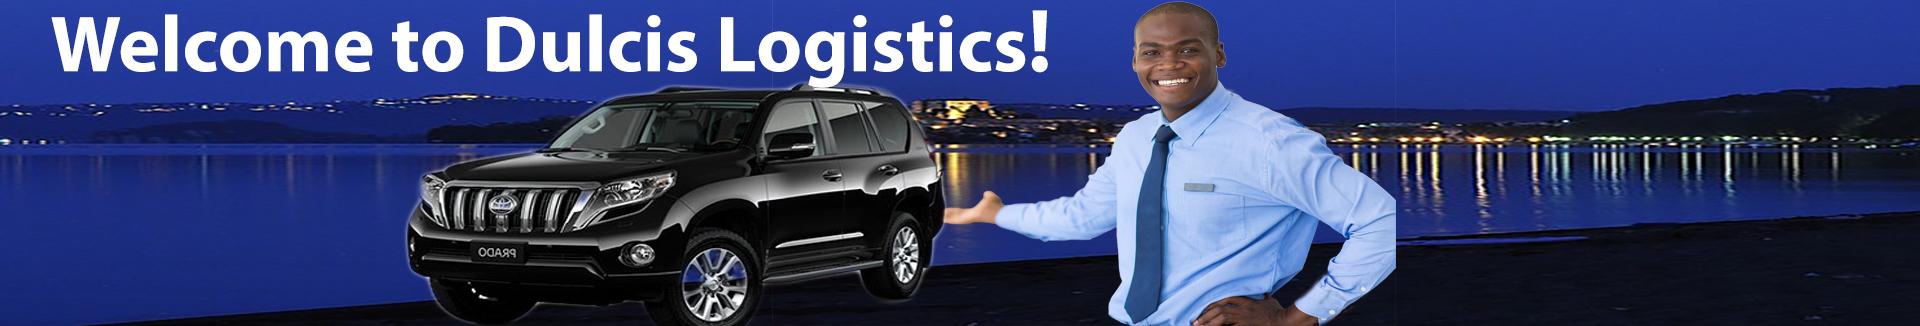 Dulcis Logistics